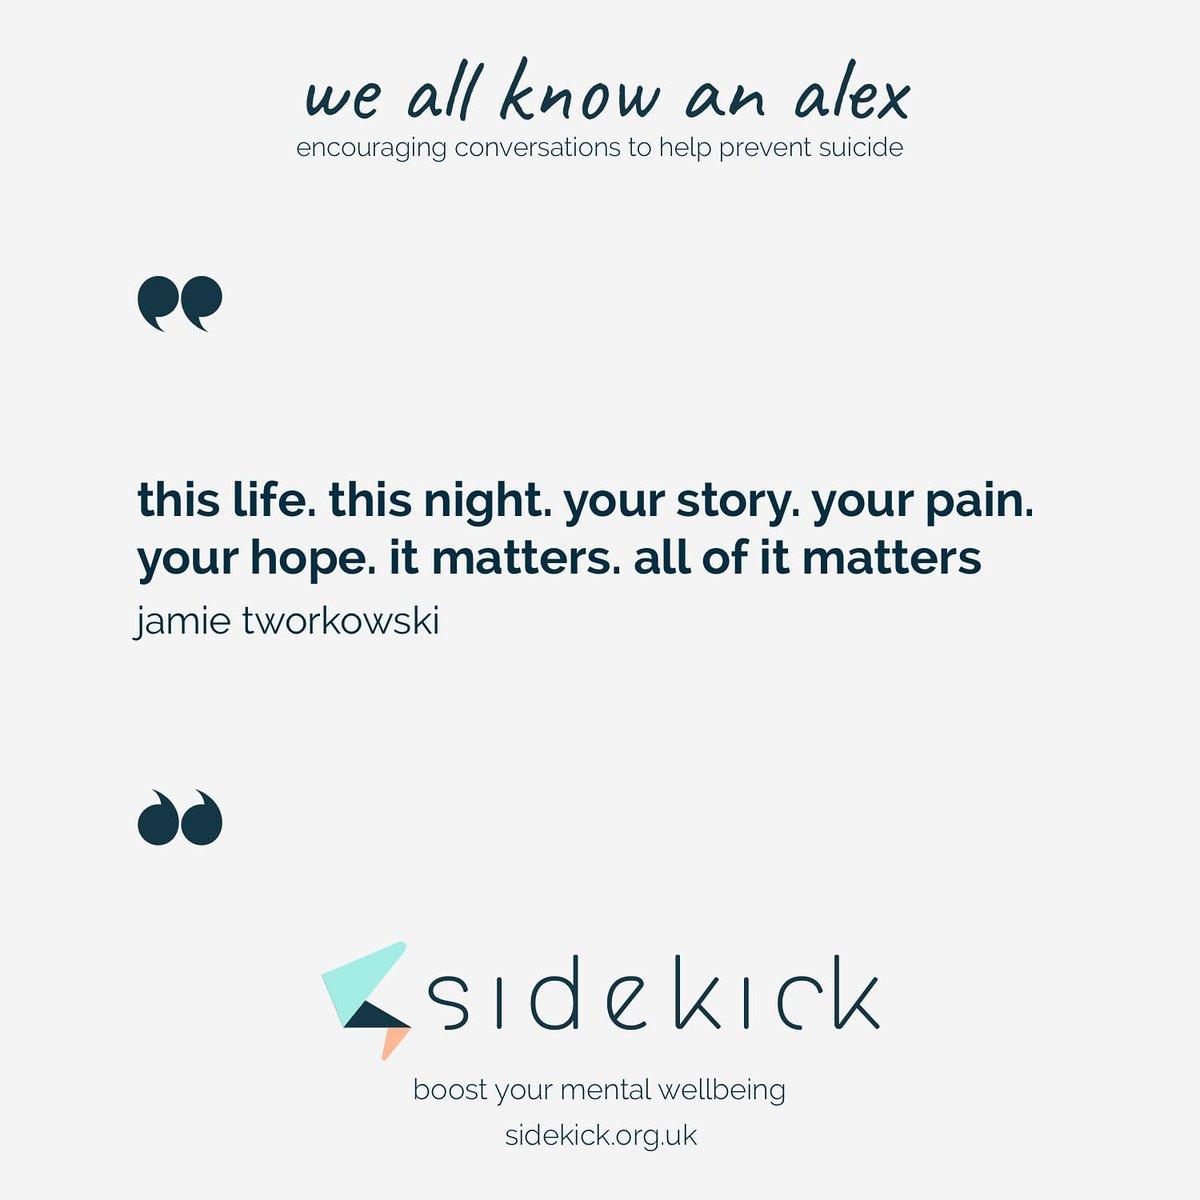 you really do matter!   #SuicidePrevention #depression#depressionawareness#depressionhelp#anxiety#anxietyawareness#endthestigma#yourenotalone#supportsaveslives#mentalhealthawareness#mentalhealth#ptsd#trauma#mentalillness#bipolar#WeAllKnowAnAlex https://t.co/1v0efjlYE0